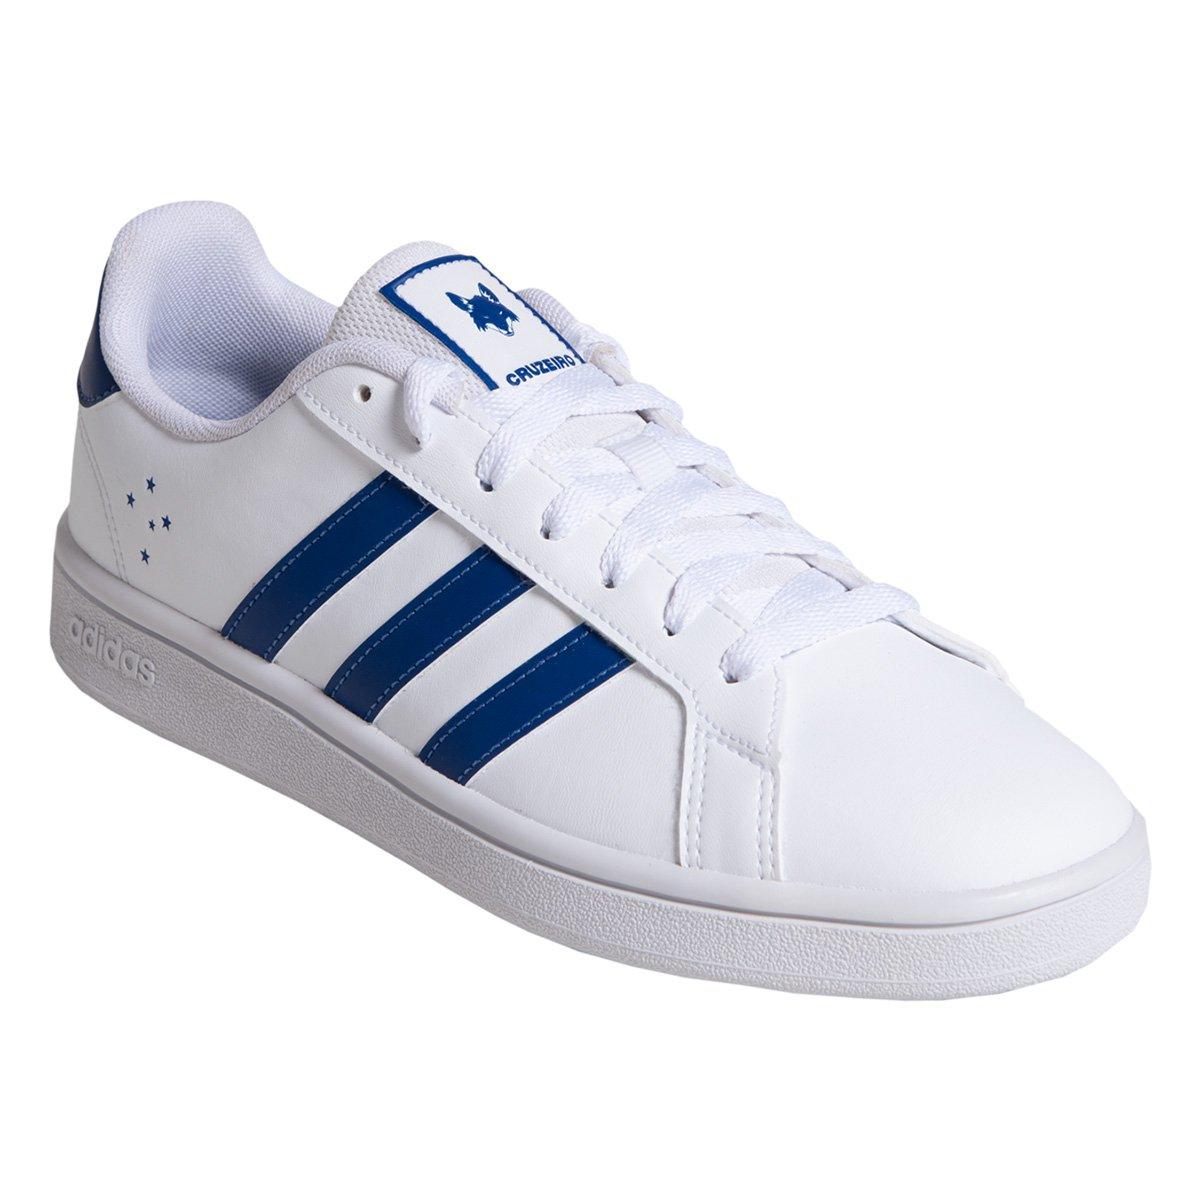 Tênis Adidas Cruzeiro Grand Court Masculino